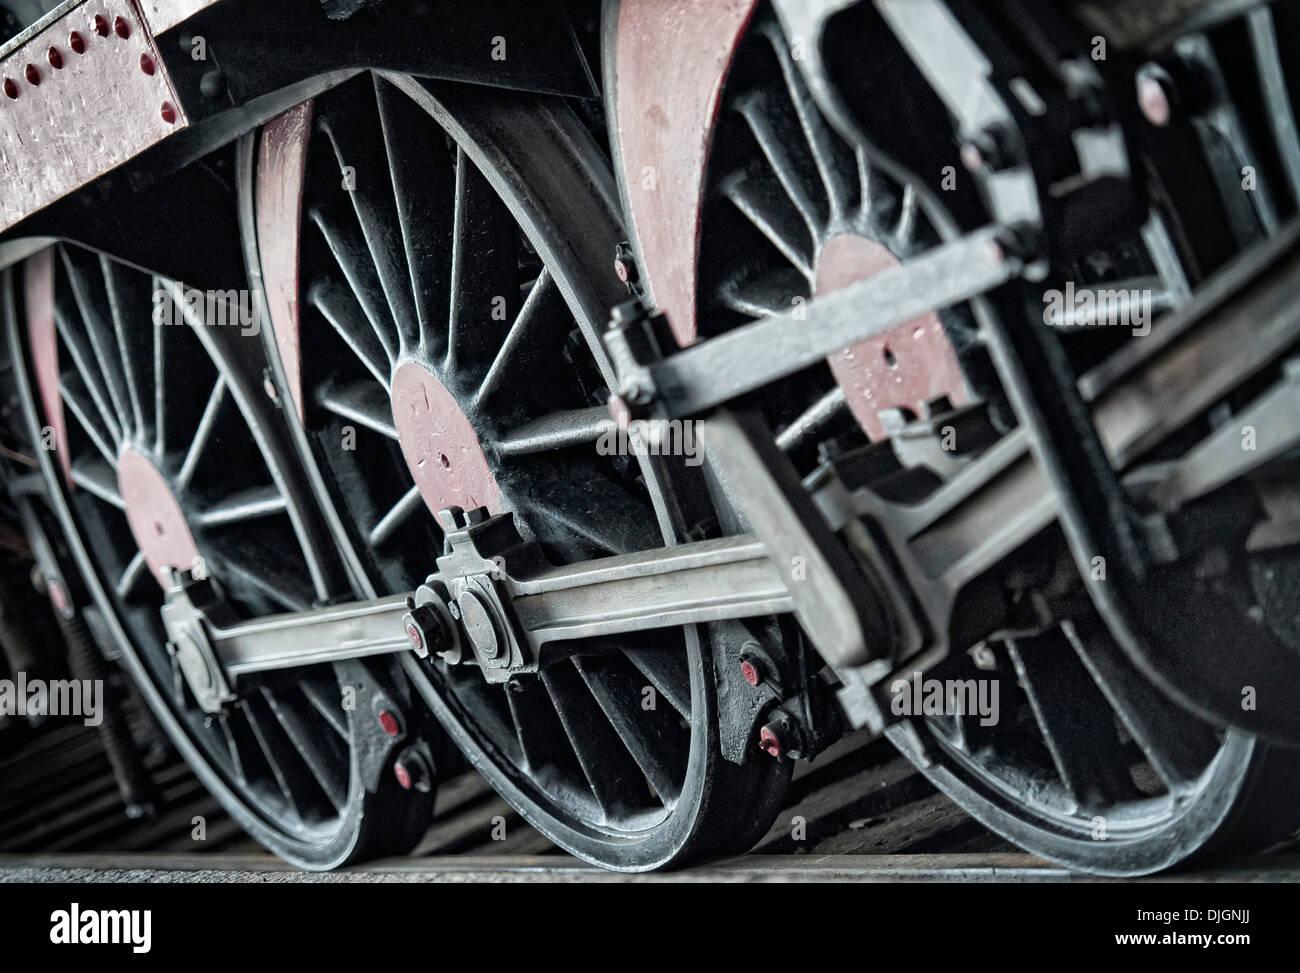 Train locomotive wheels - Stock Image